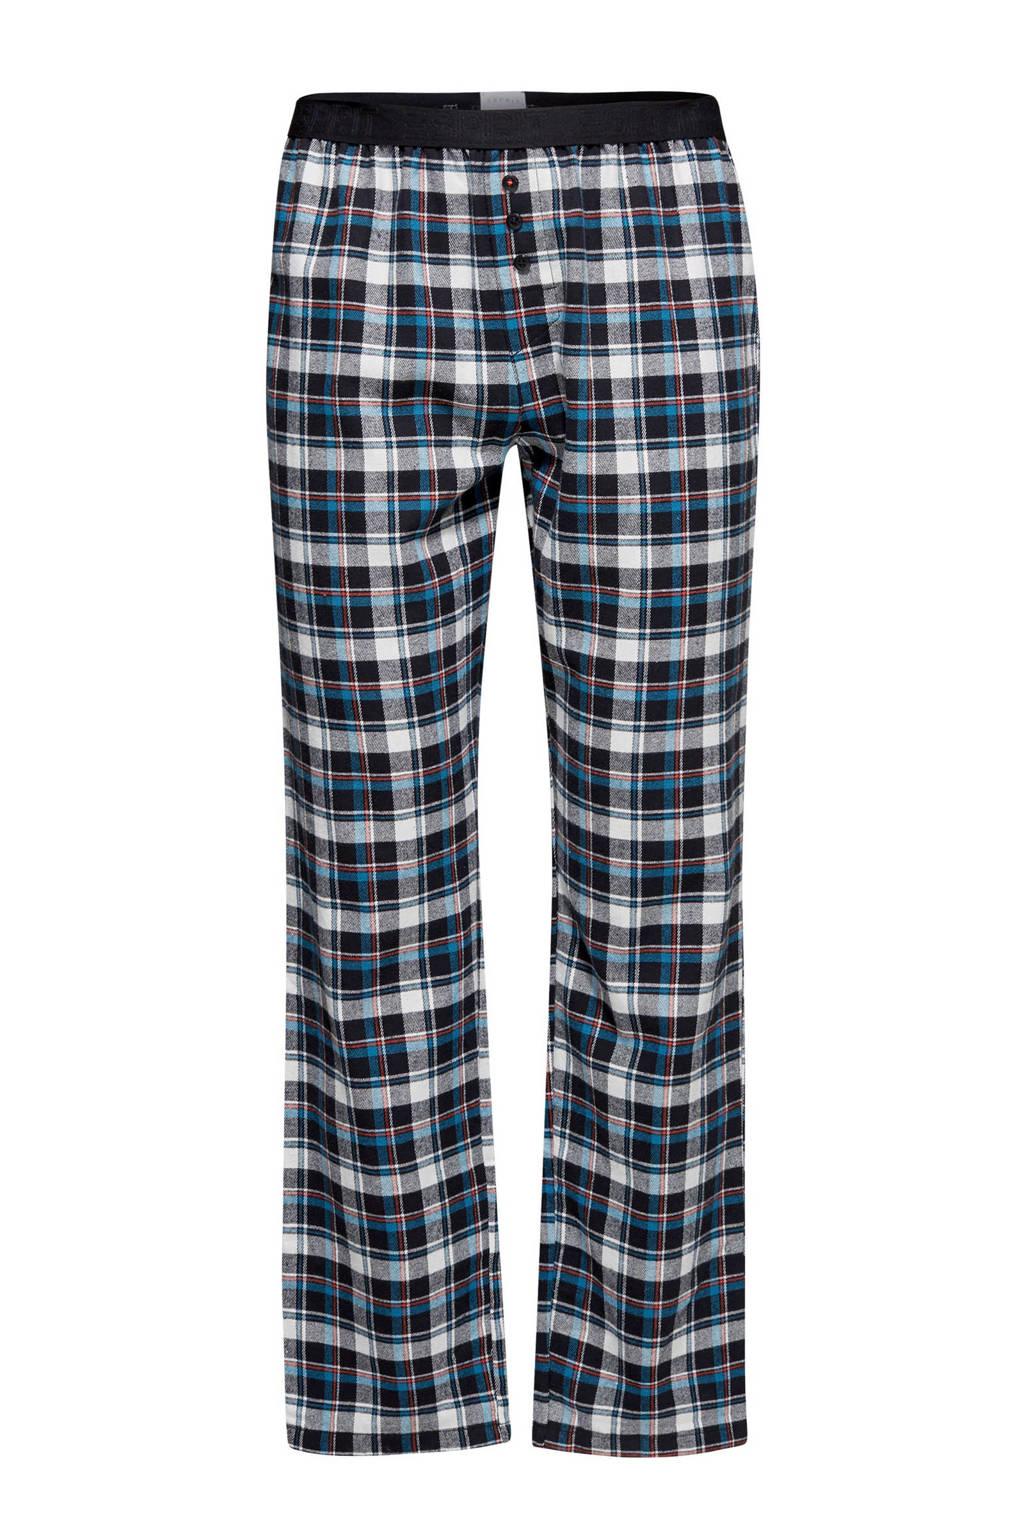 ESPRIT Men Bodywear geruite flanellen pyjamabroek blauw, Blauw